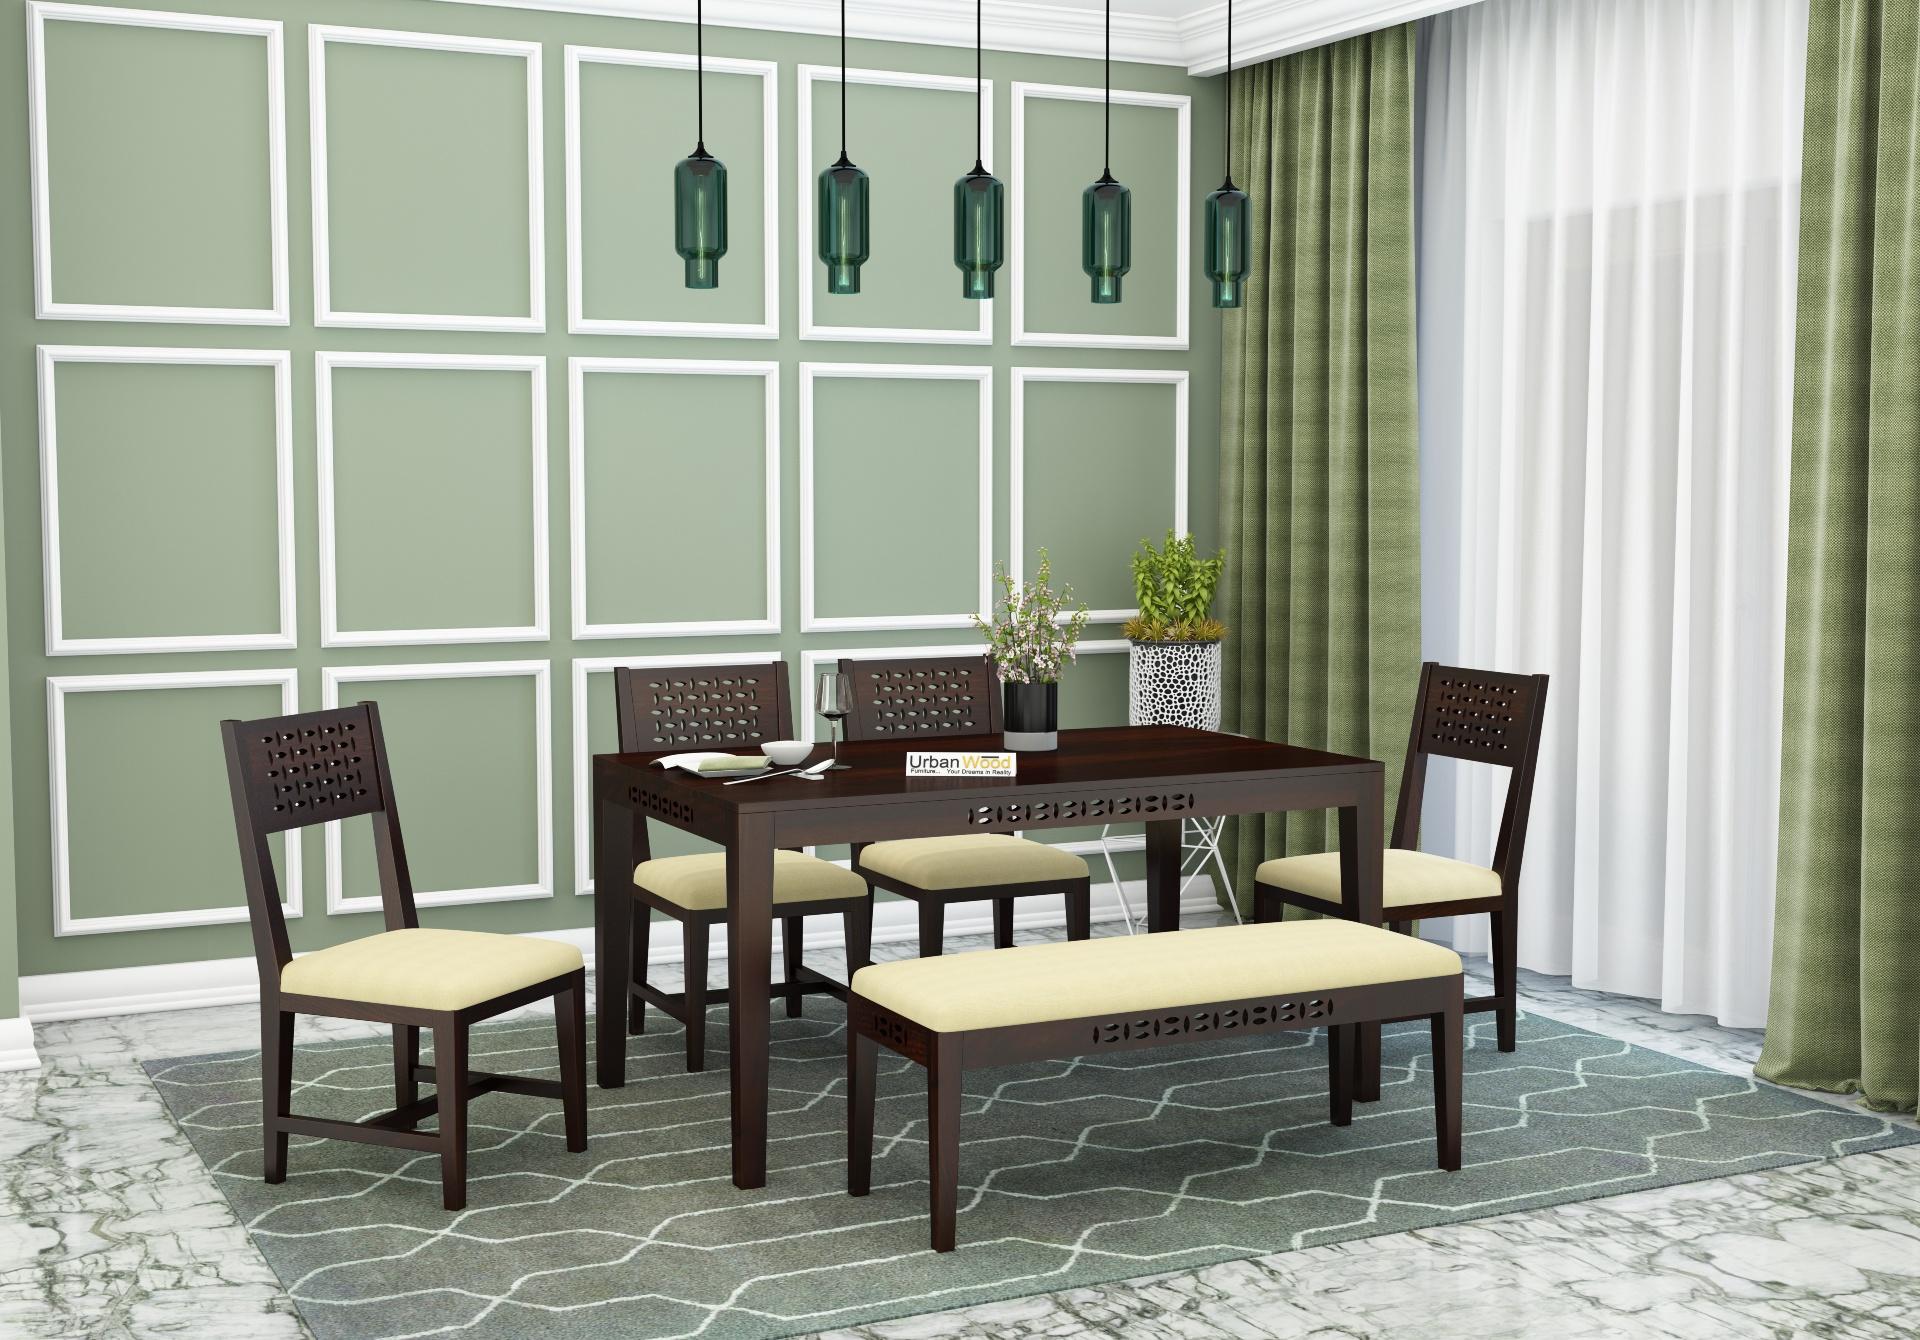 Woodora 6 Seater Dining Set Cushion With Bench <small>(Walnut Finish)</small>